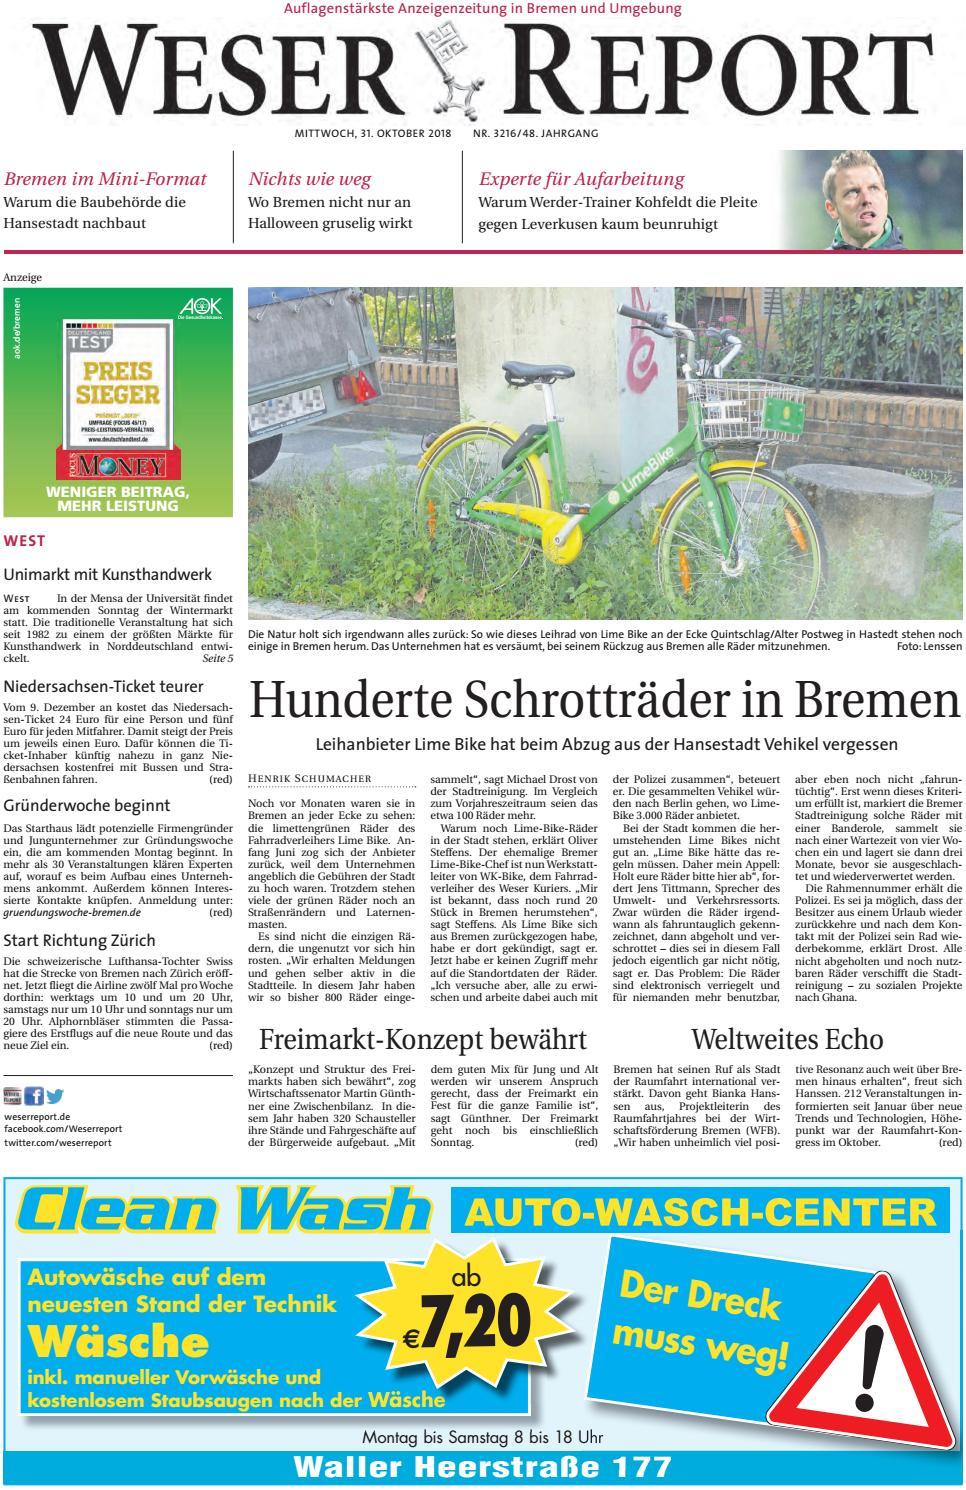 Weser Report West Vom 31 10 2018 By Kps Verlagsgesellschaft Mbh